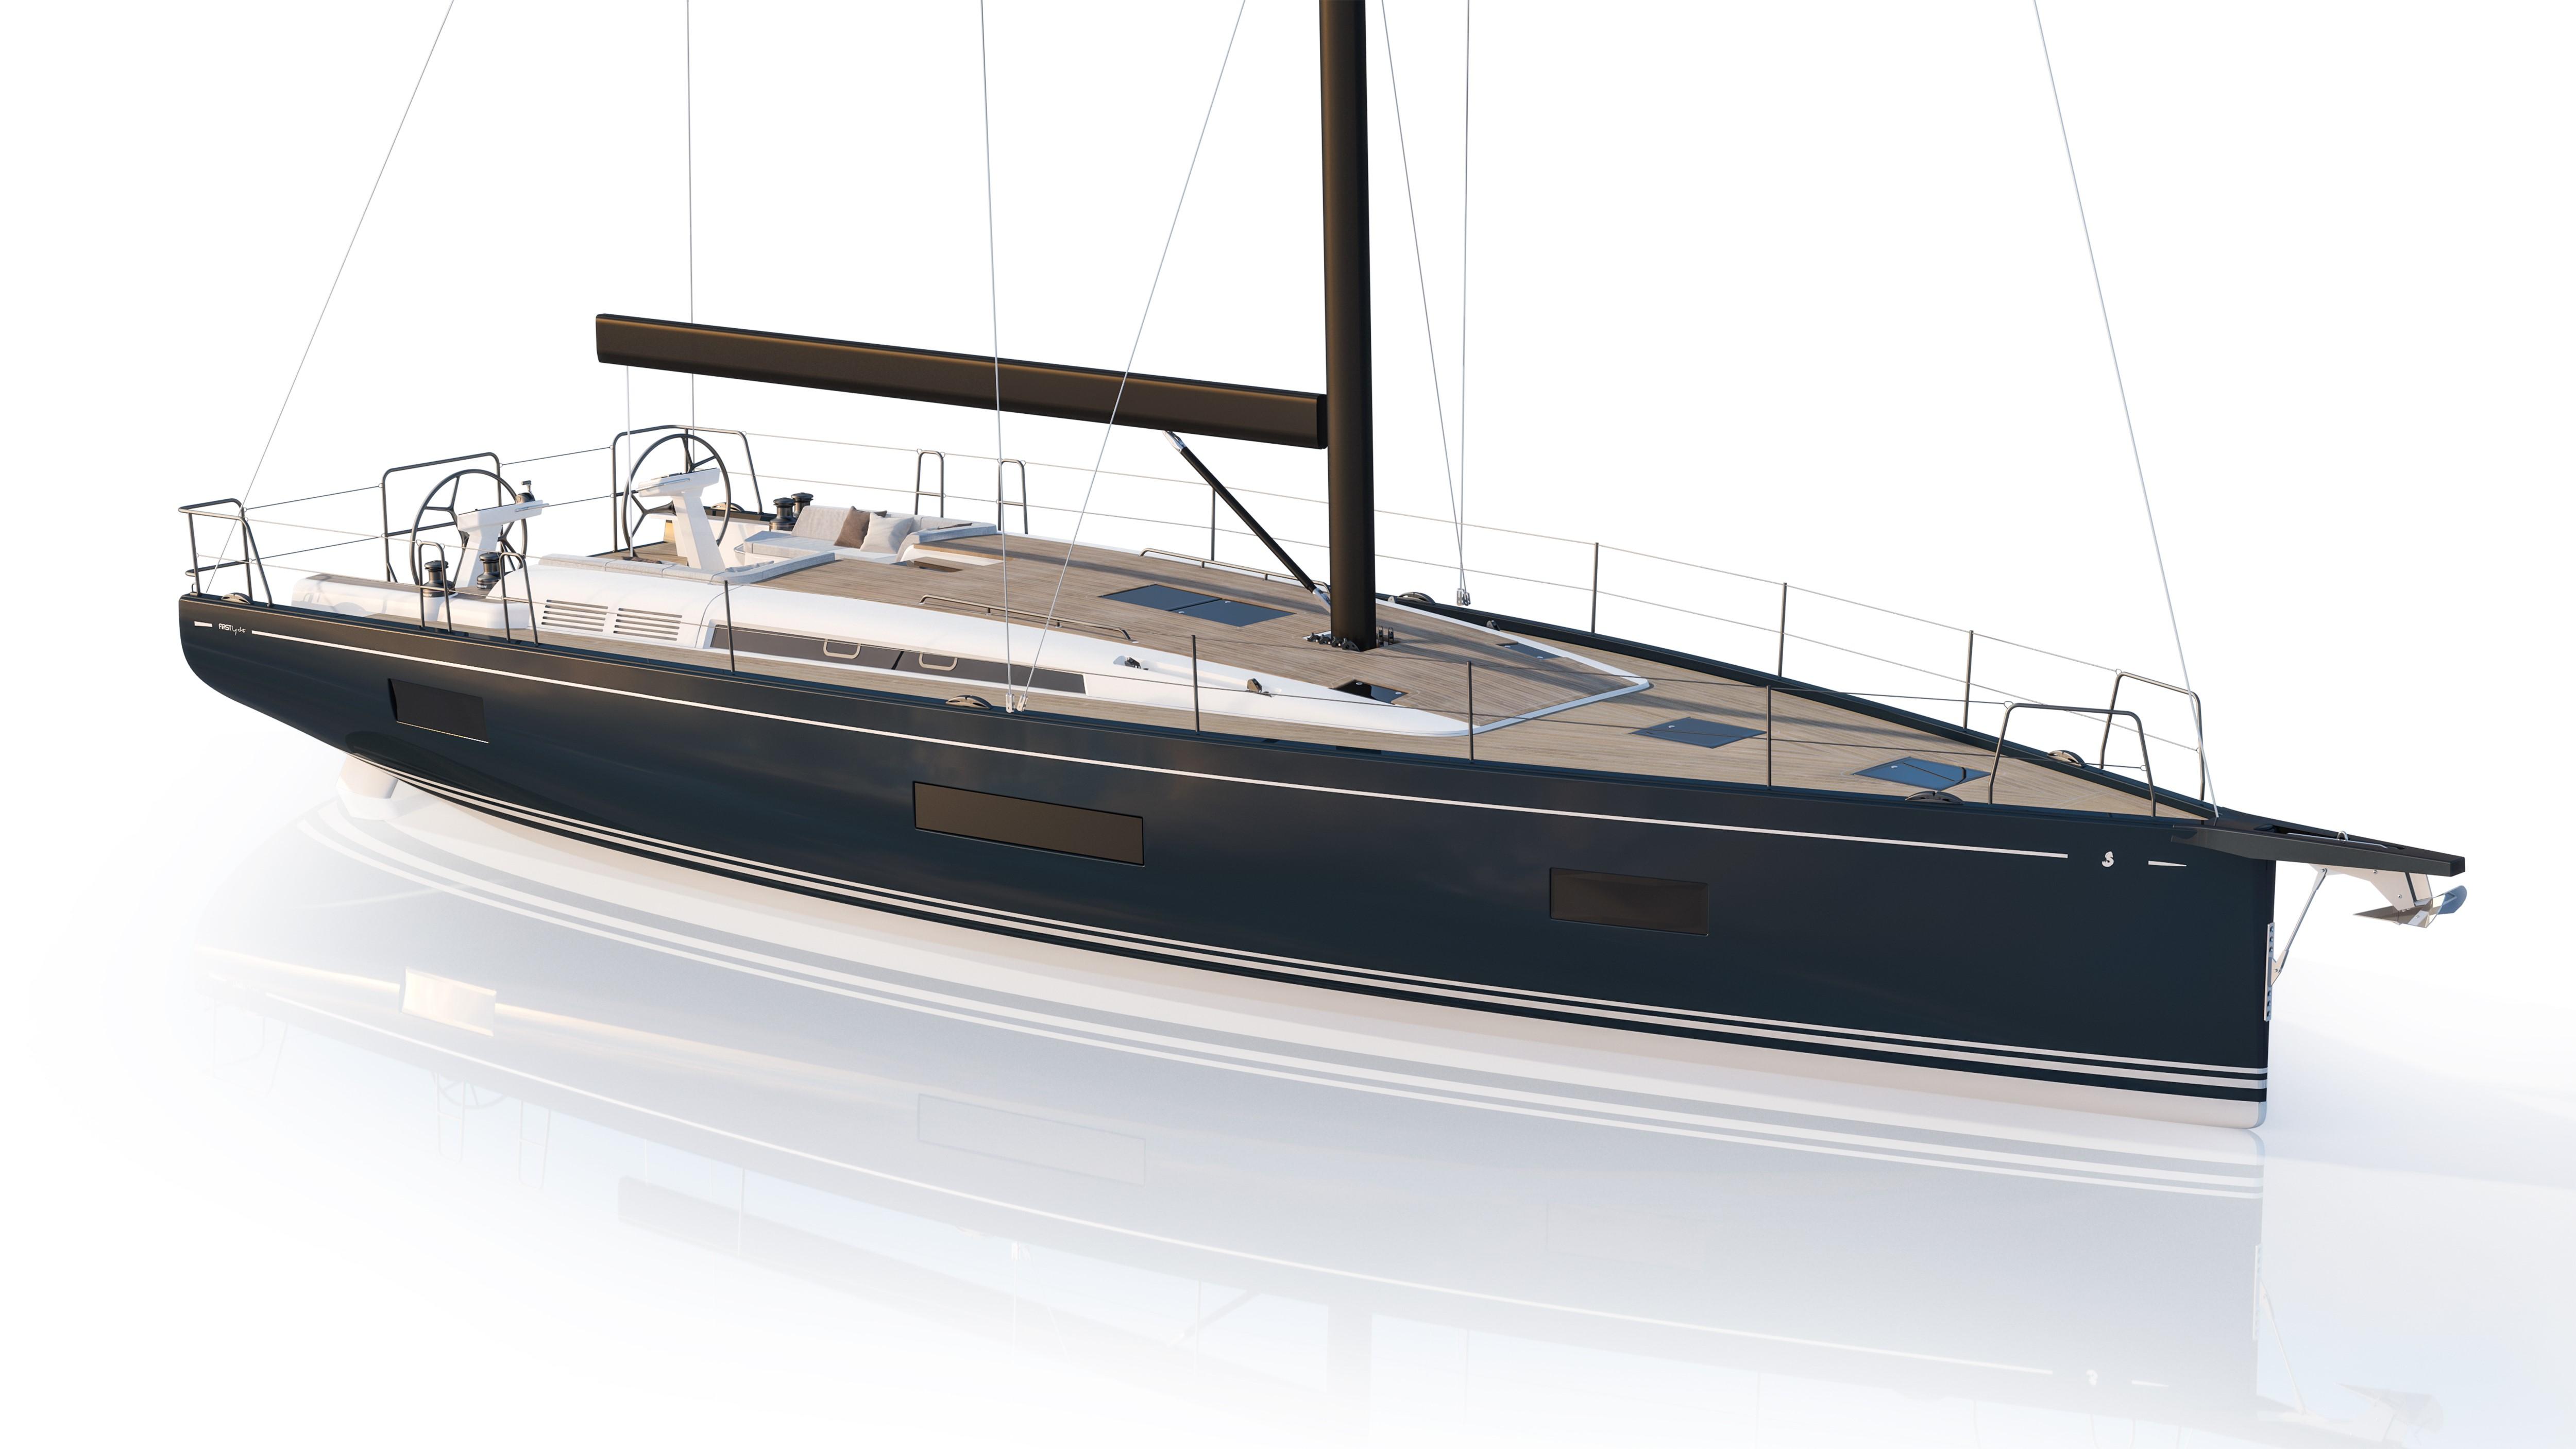 Beneteau First Yacht 53 Beneteau First Yacht 53